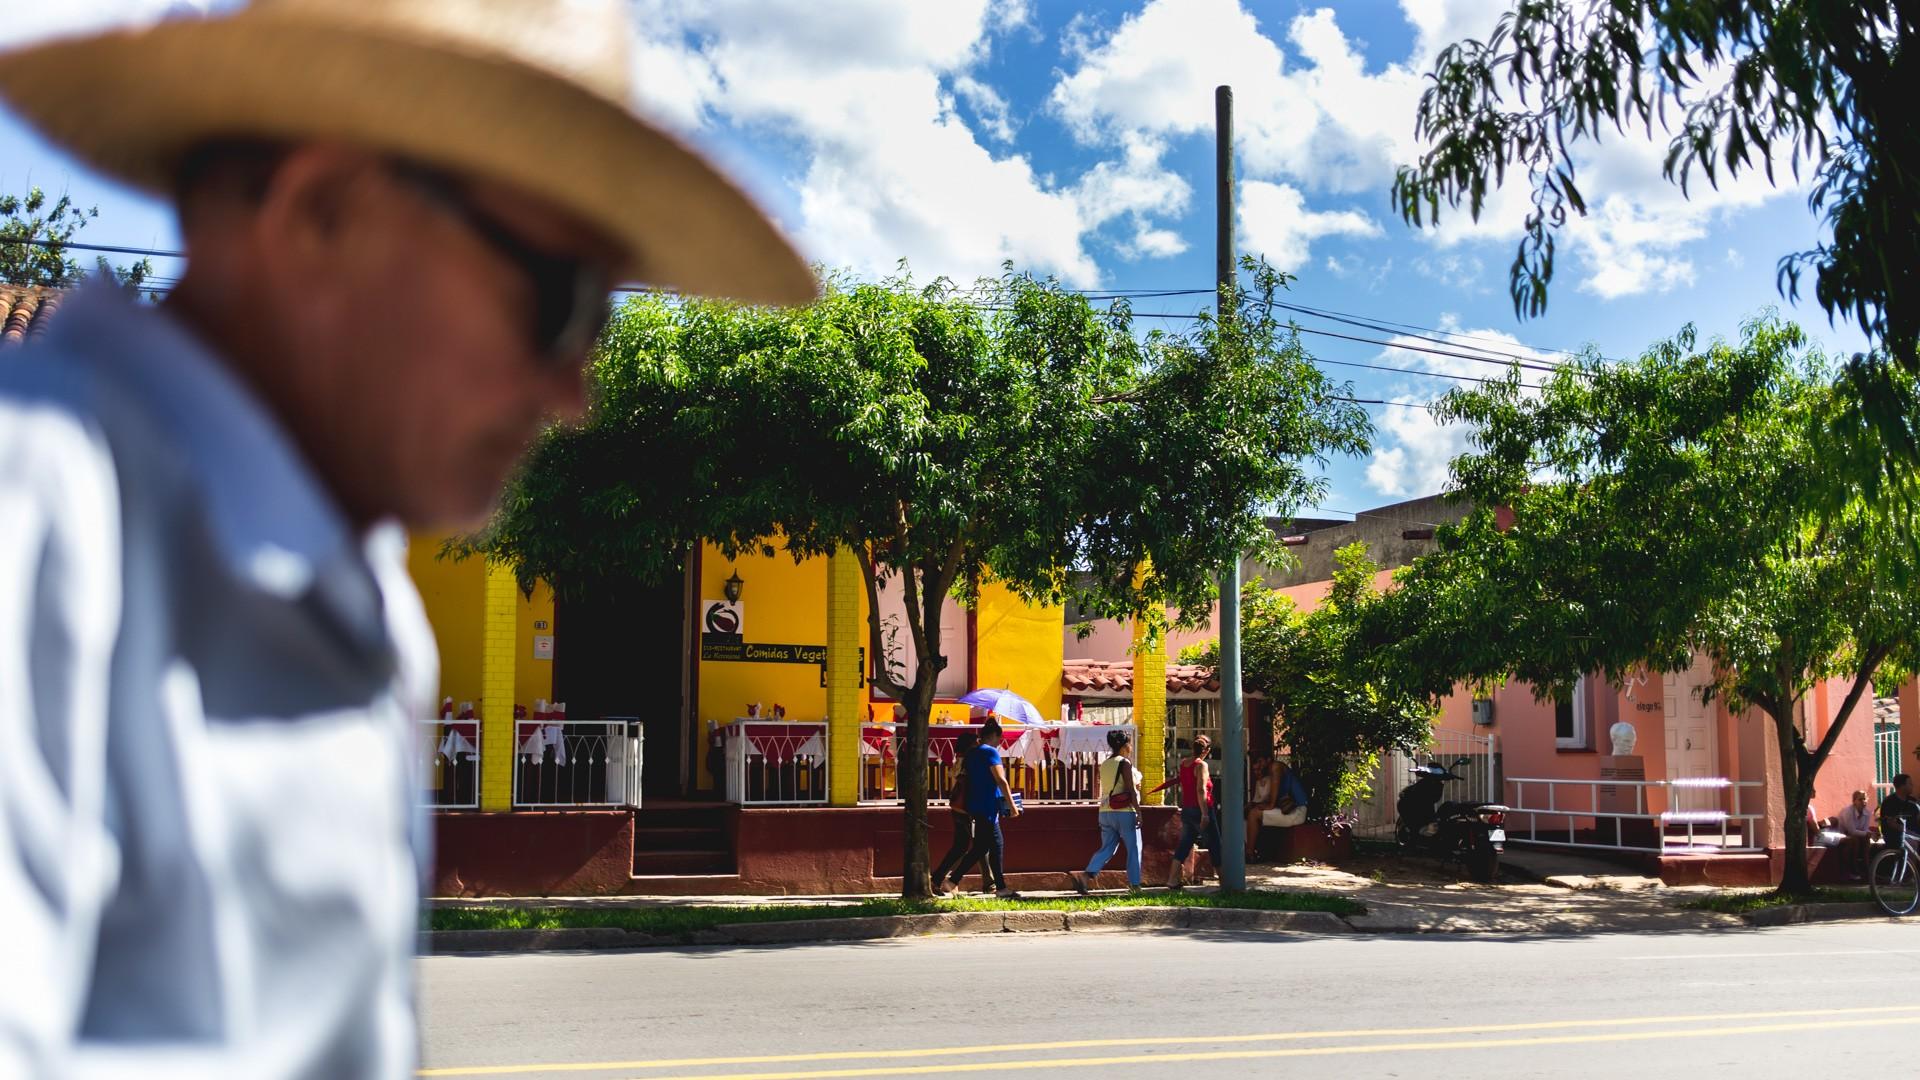 Damien-Dohmen-Photographe-Cuba-12